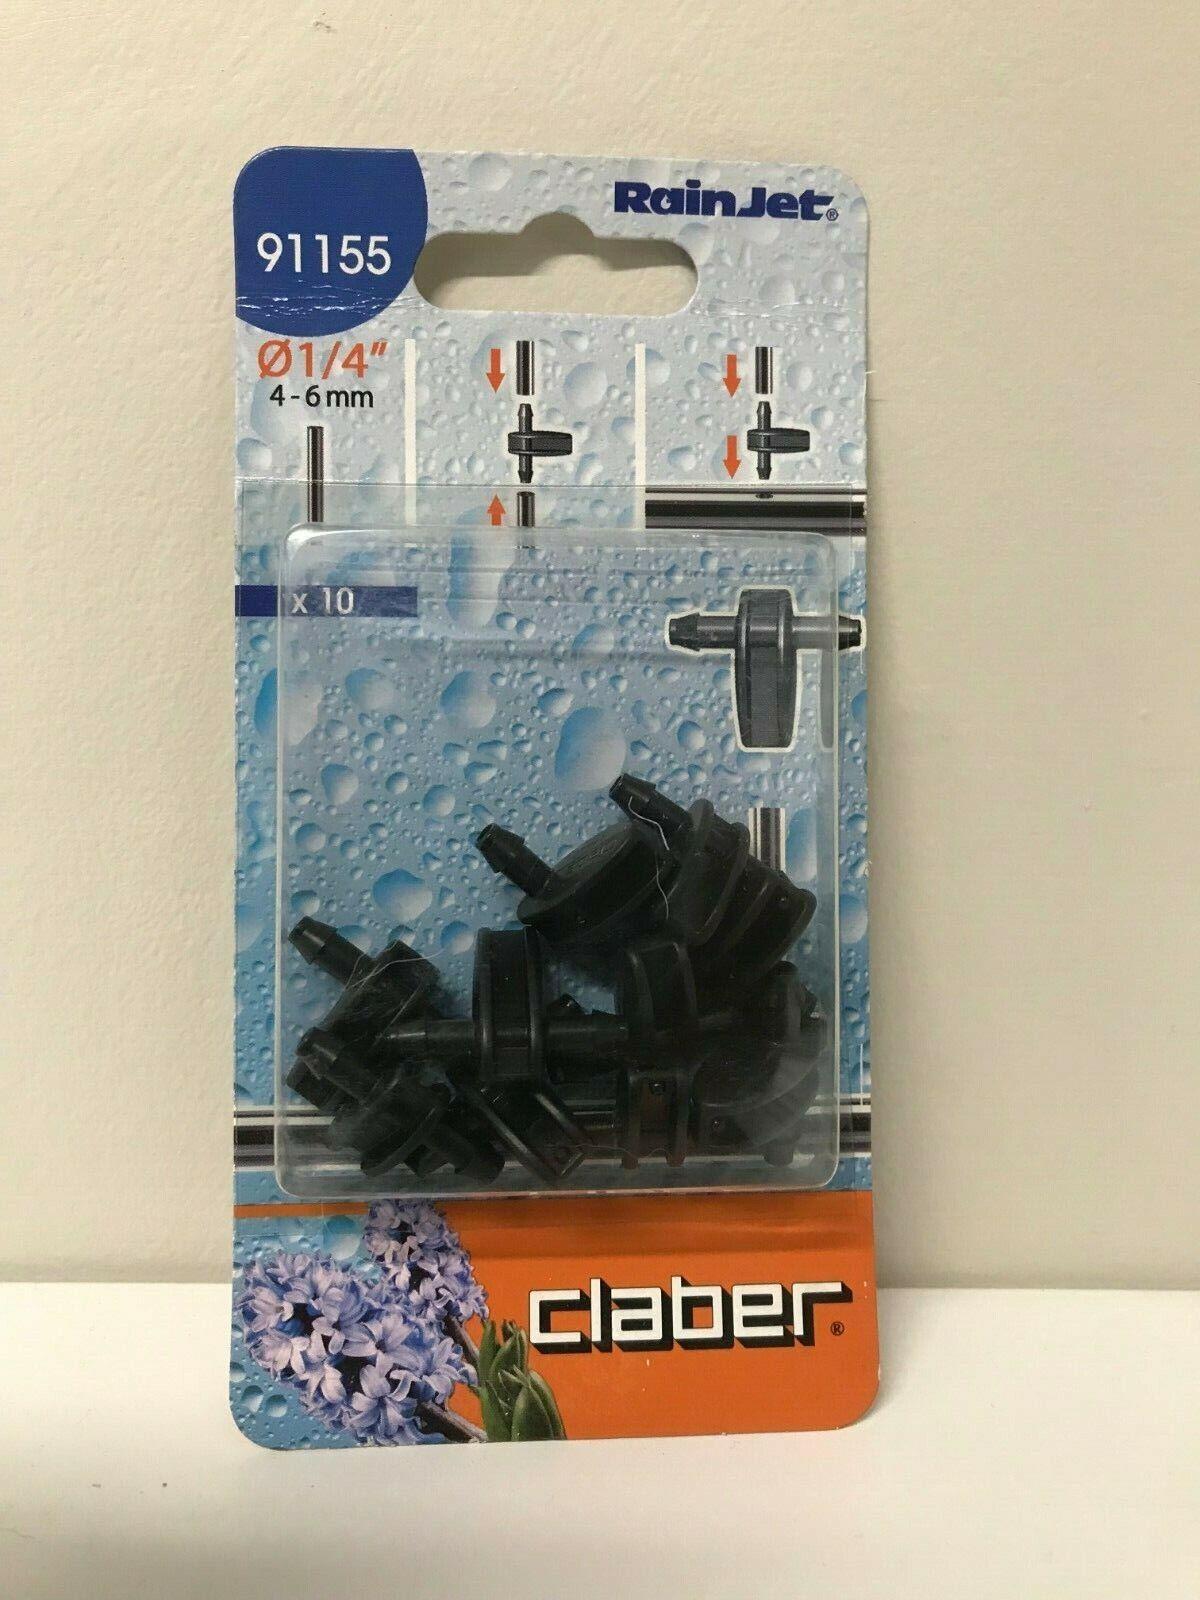 91155 Claber RainJet 1/4